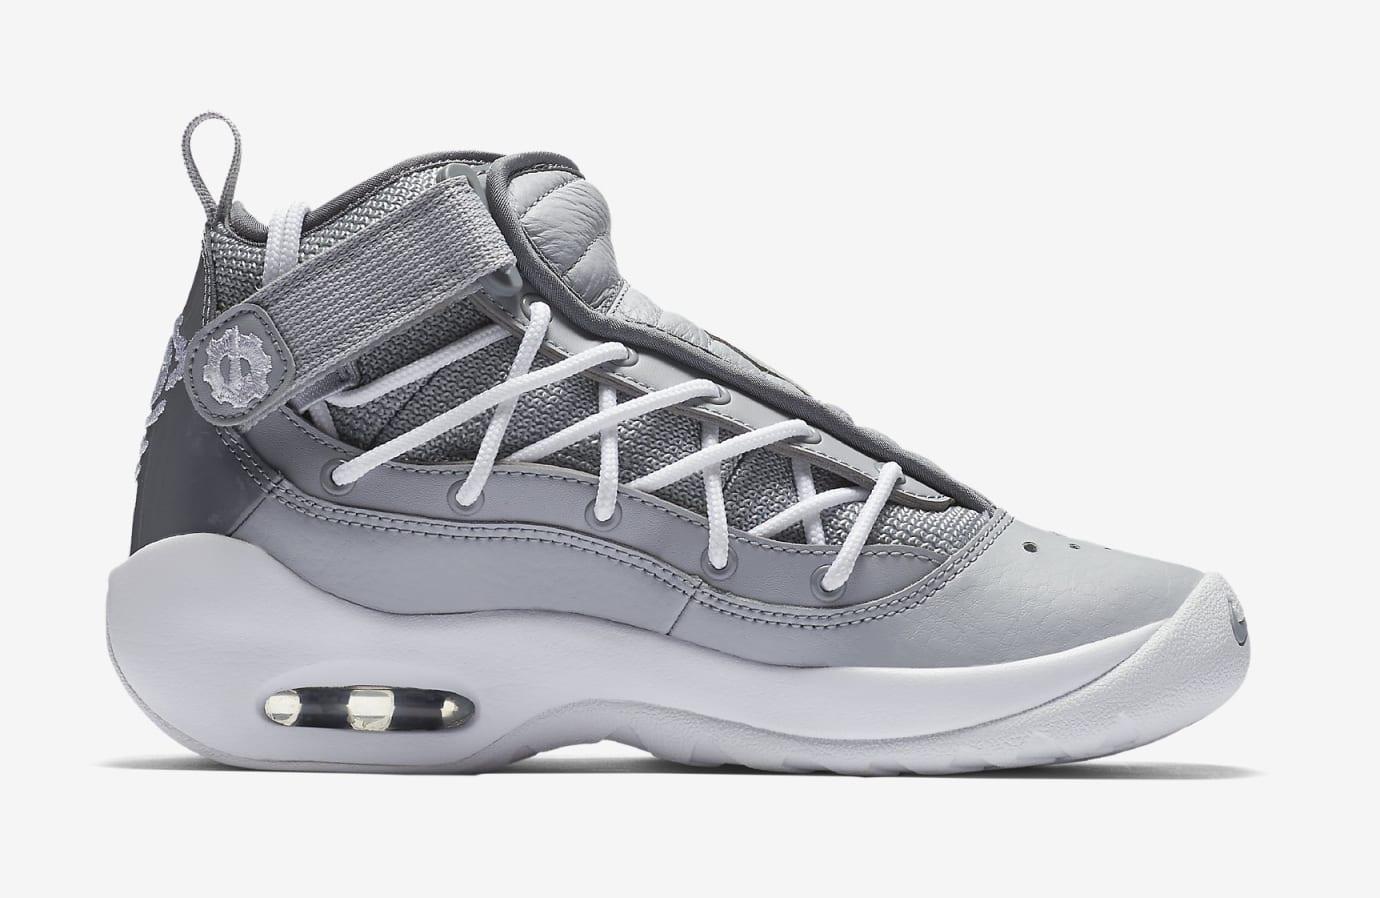 Nike Air Shake Ndestrukt 'Cool Grey' AA2888-002 (Medial)